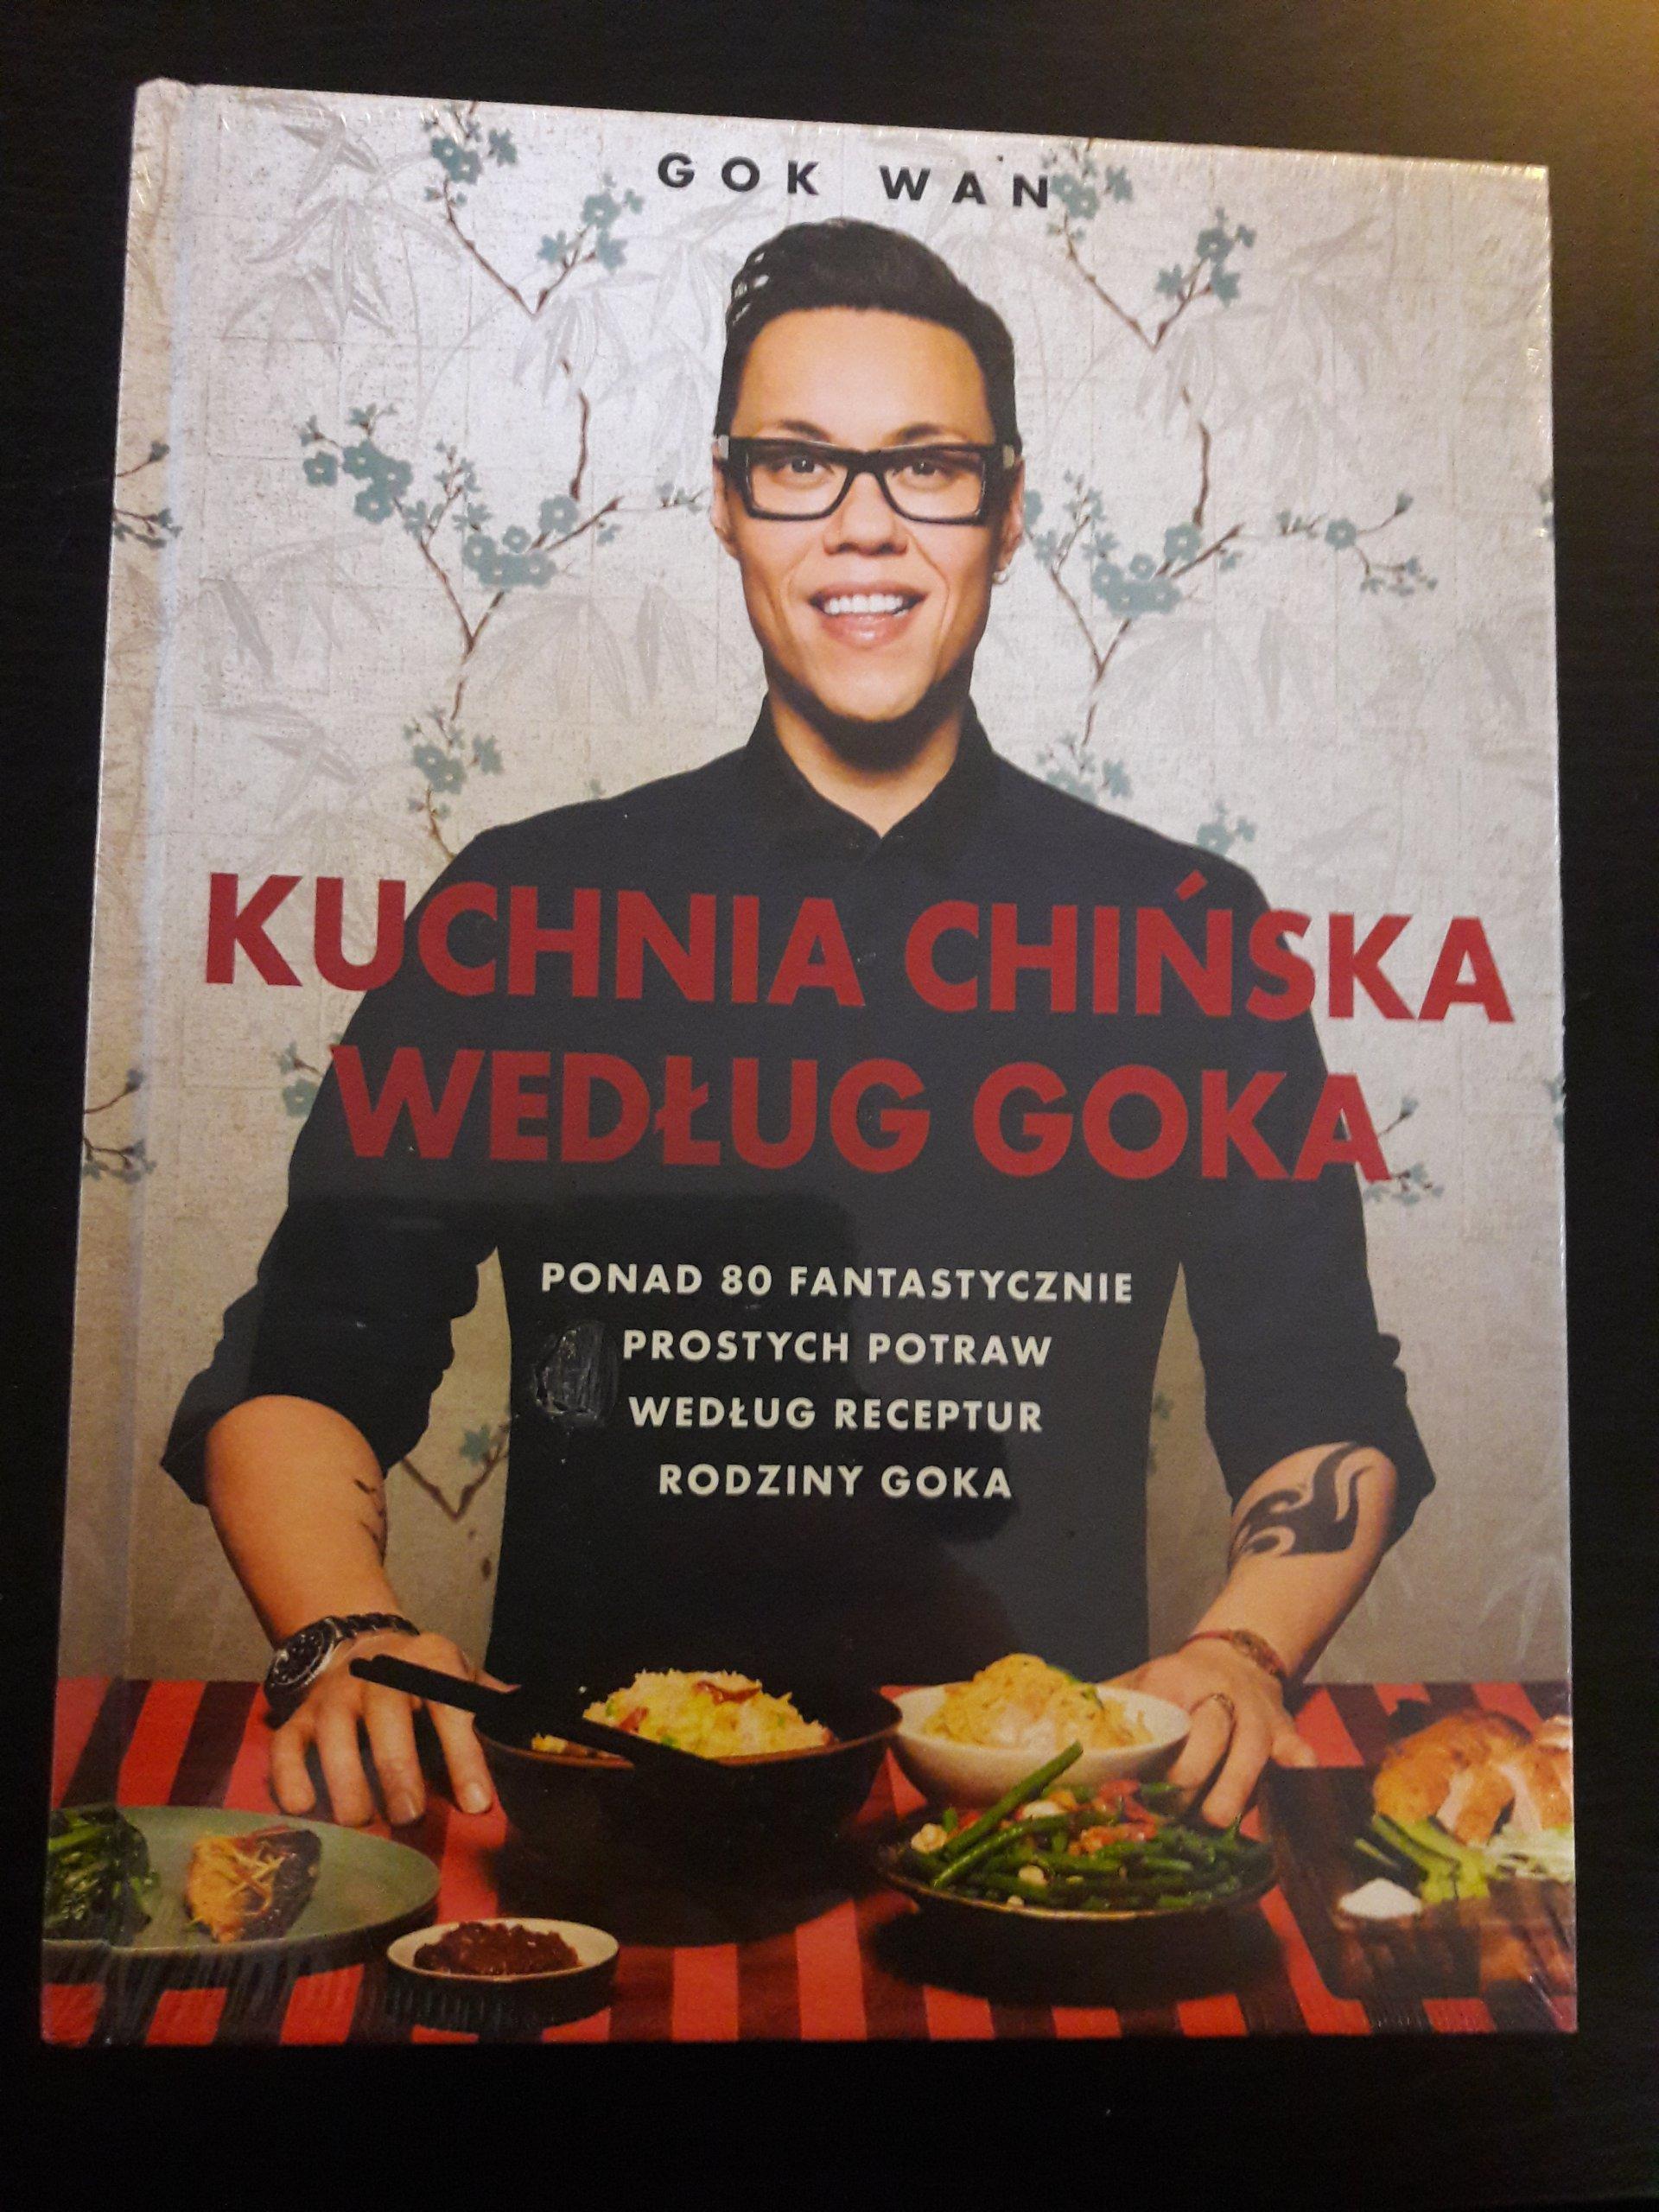 Kuchnia Chinska Wedlug Goka Nowafolia 6947346400